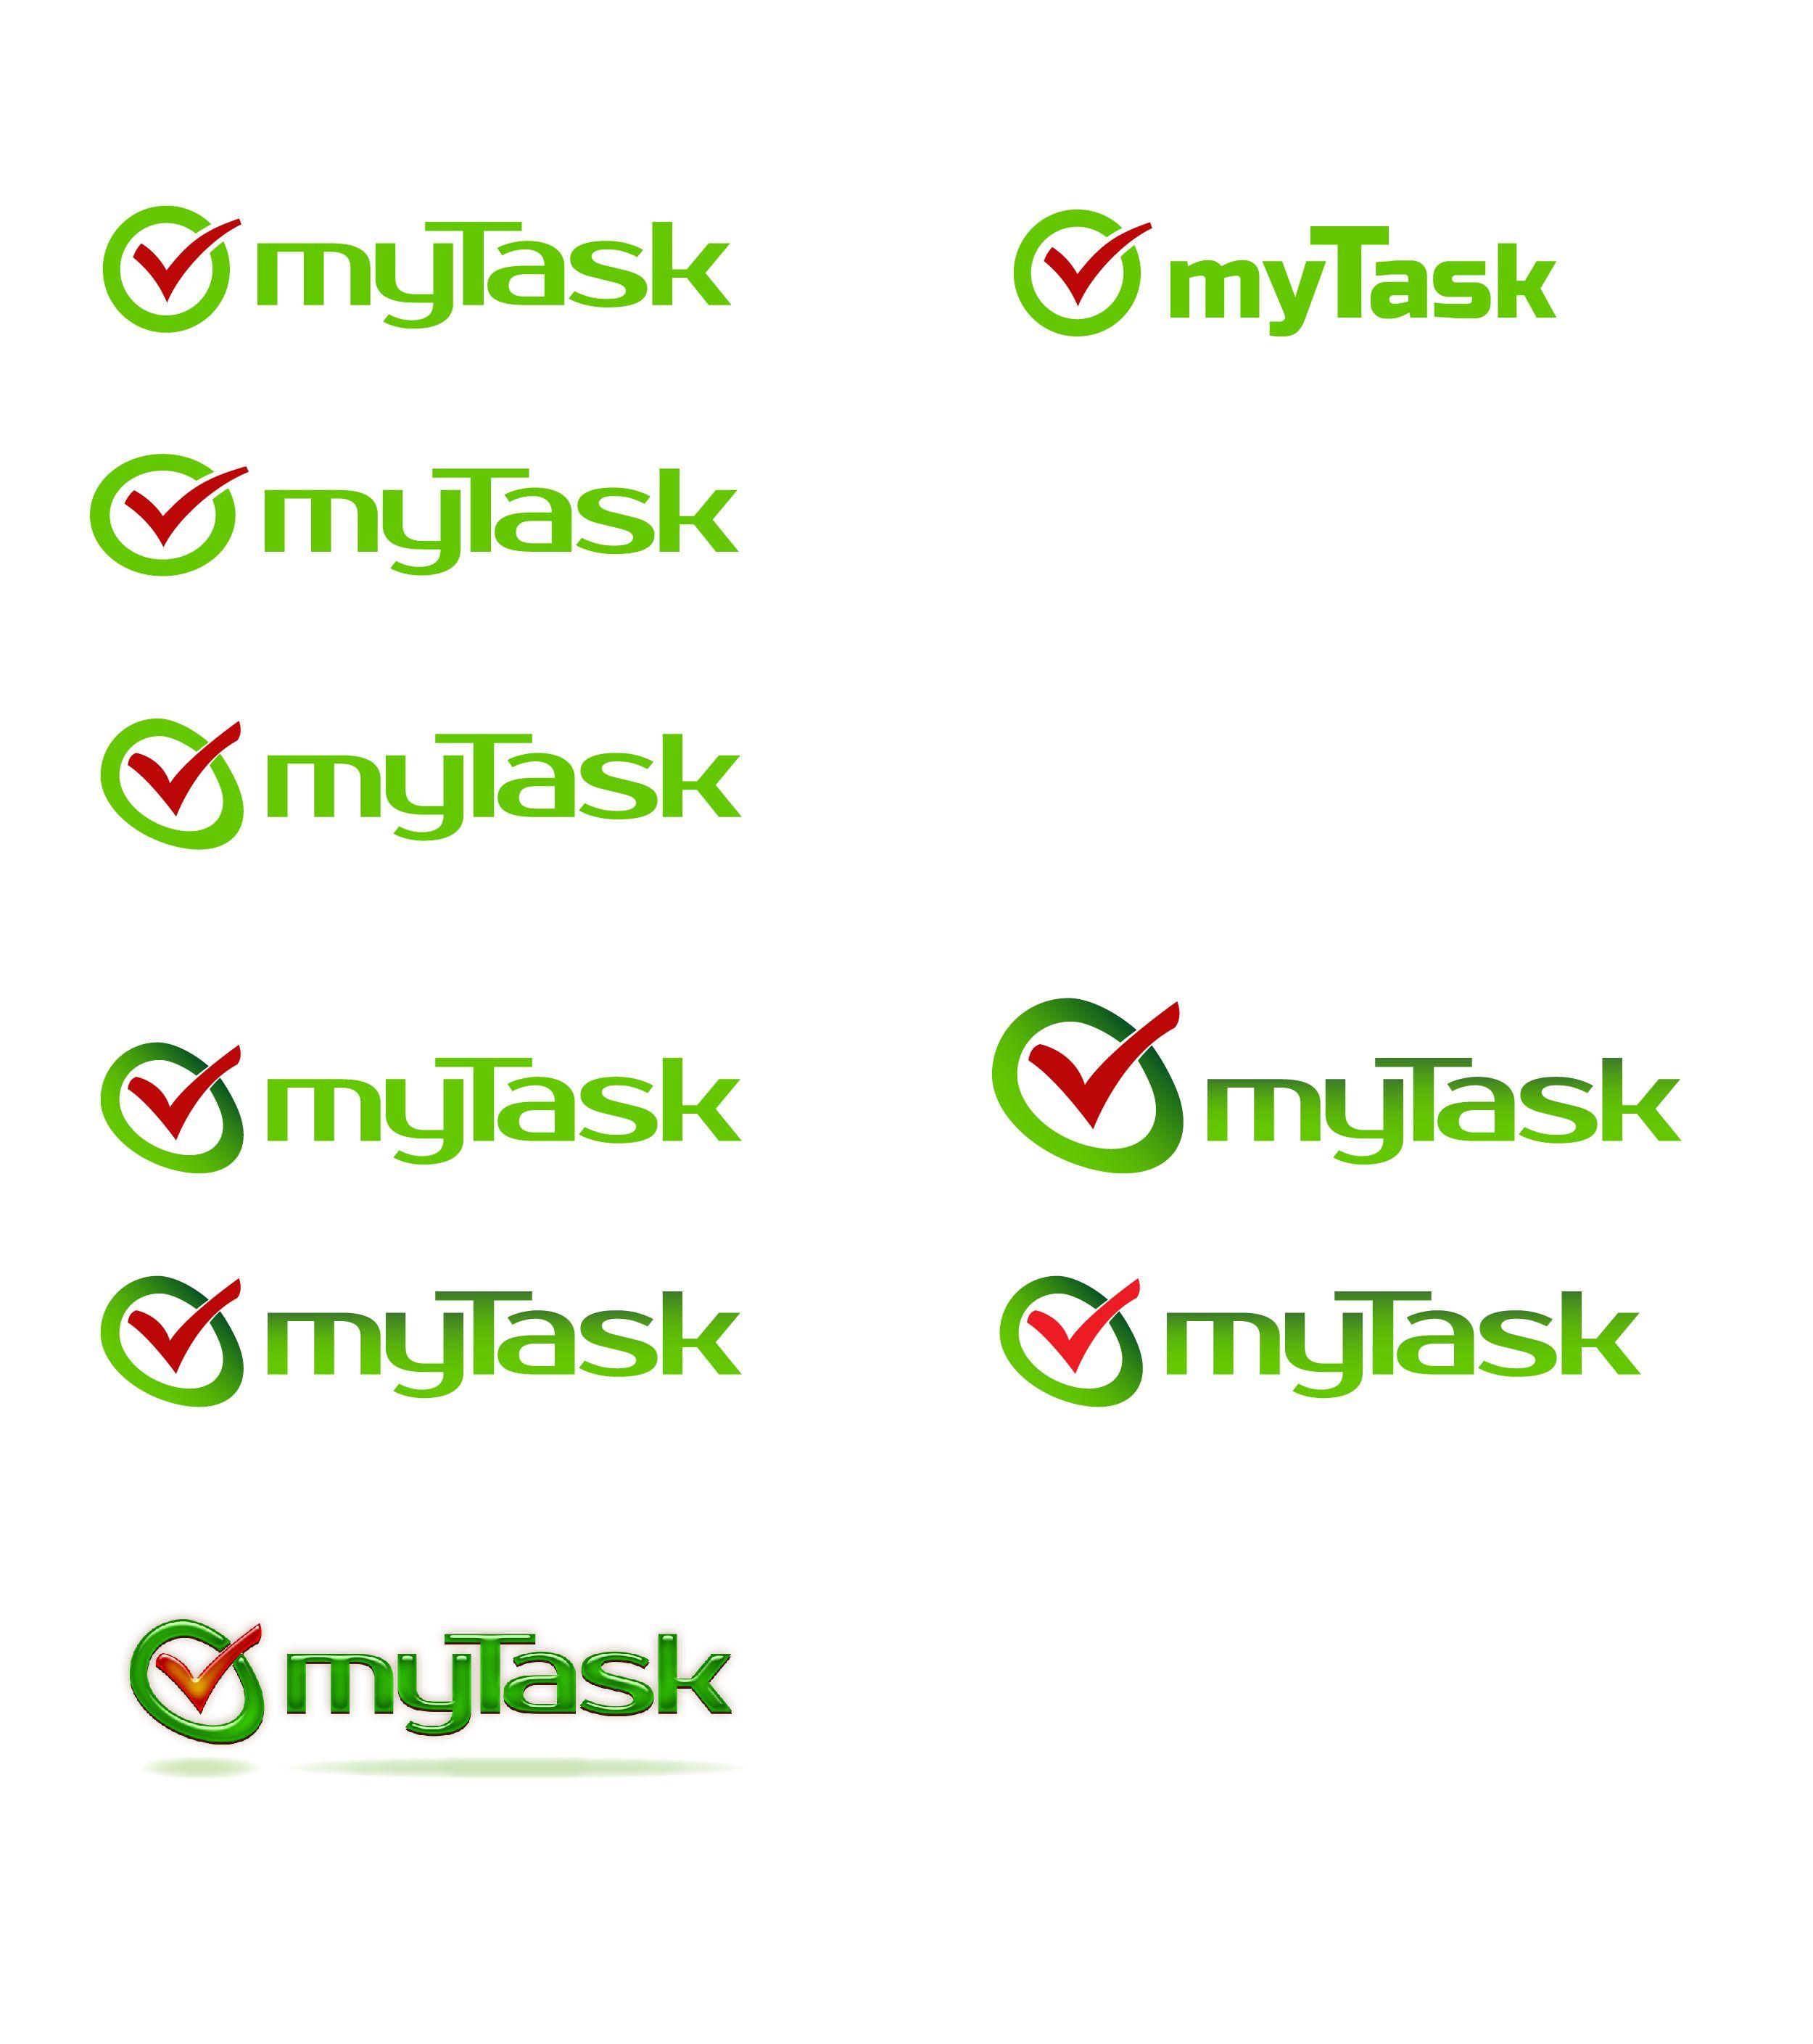 Доработка логотипа компании myTask - дизайнер Luminosi